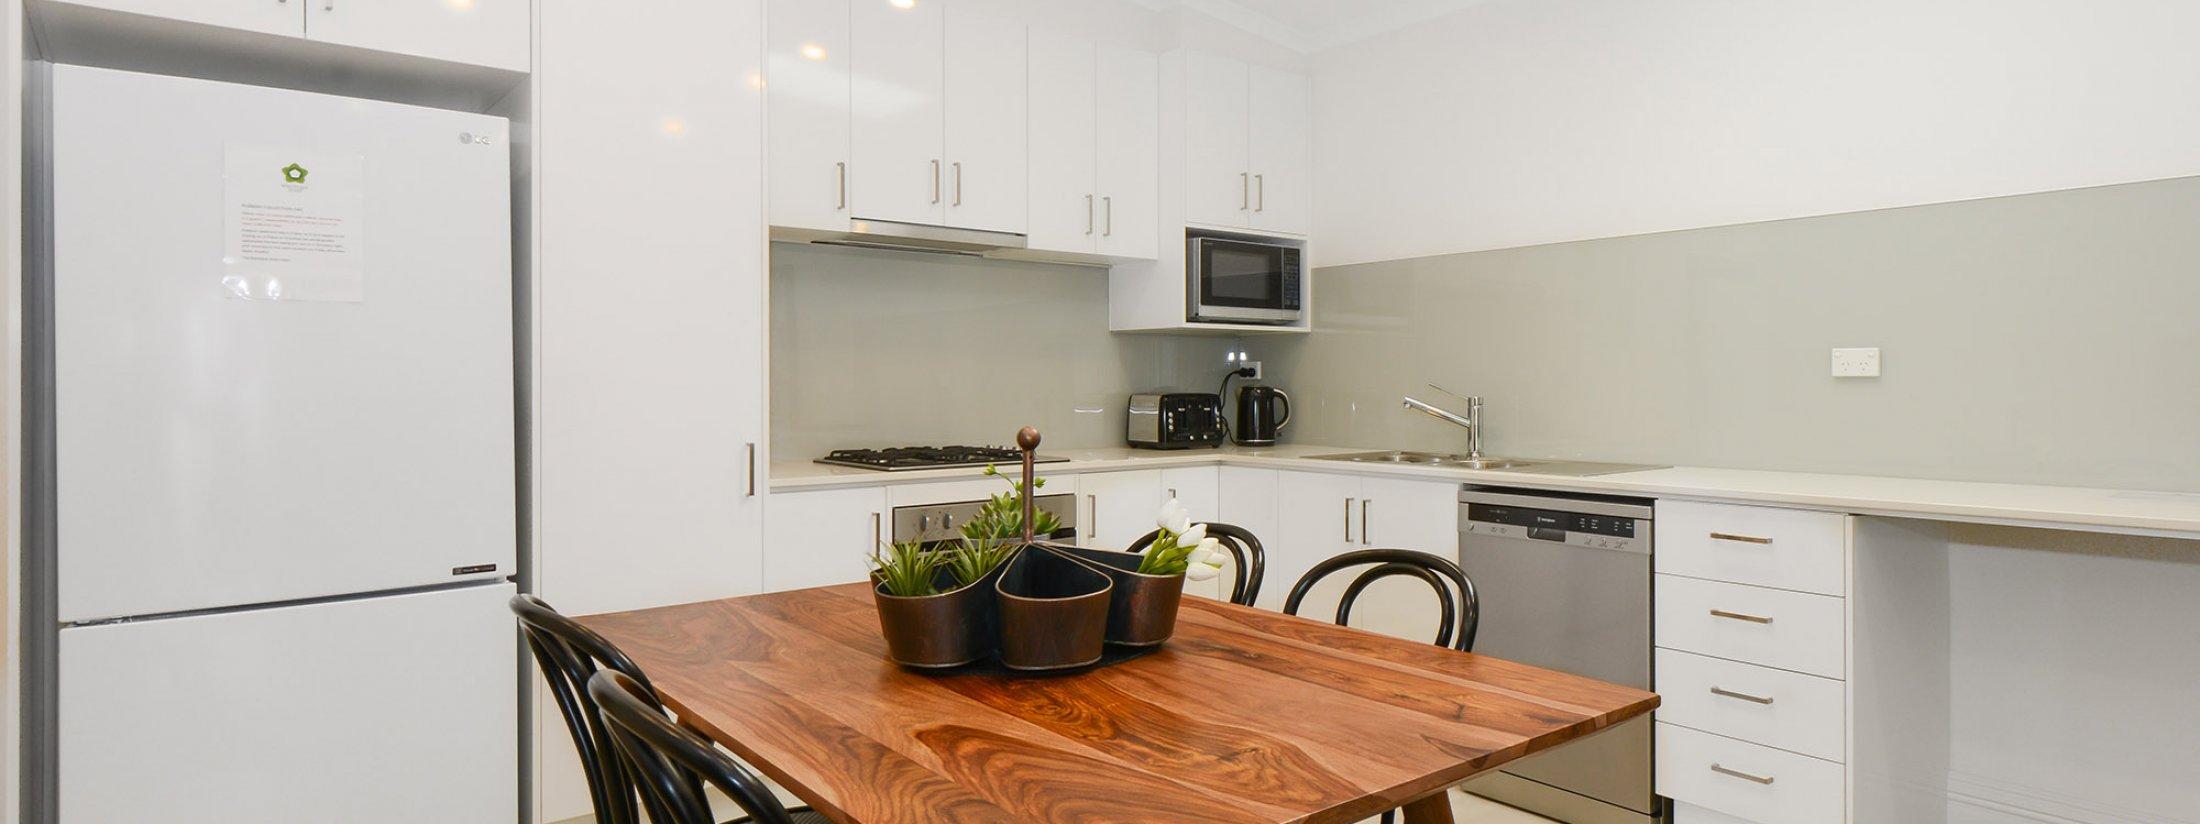 Carlton Terrace - Carlton - Dining Kitchen Area